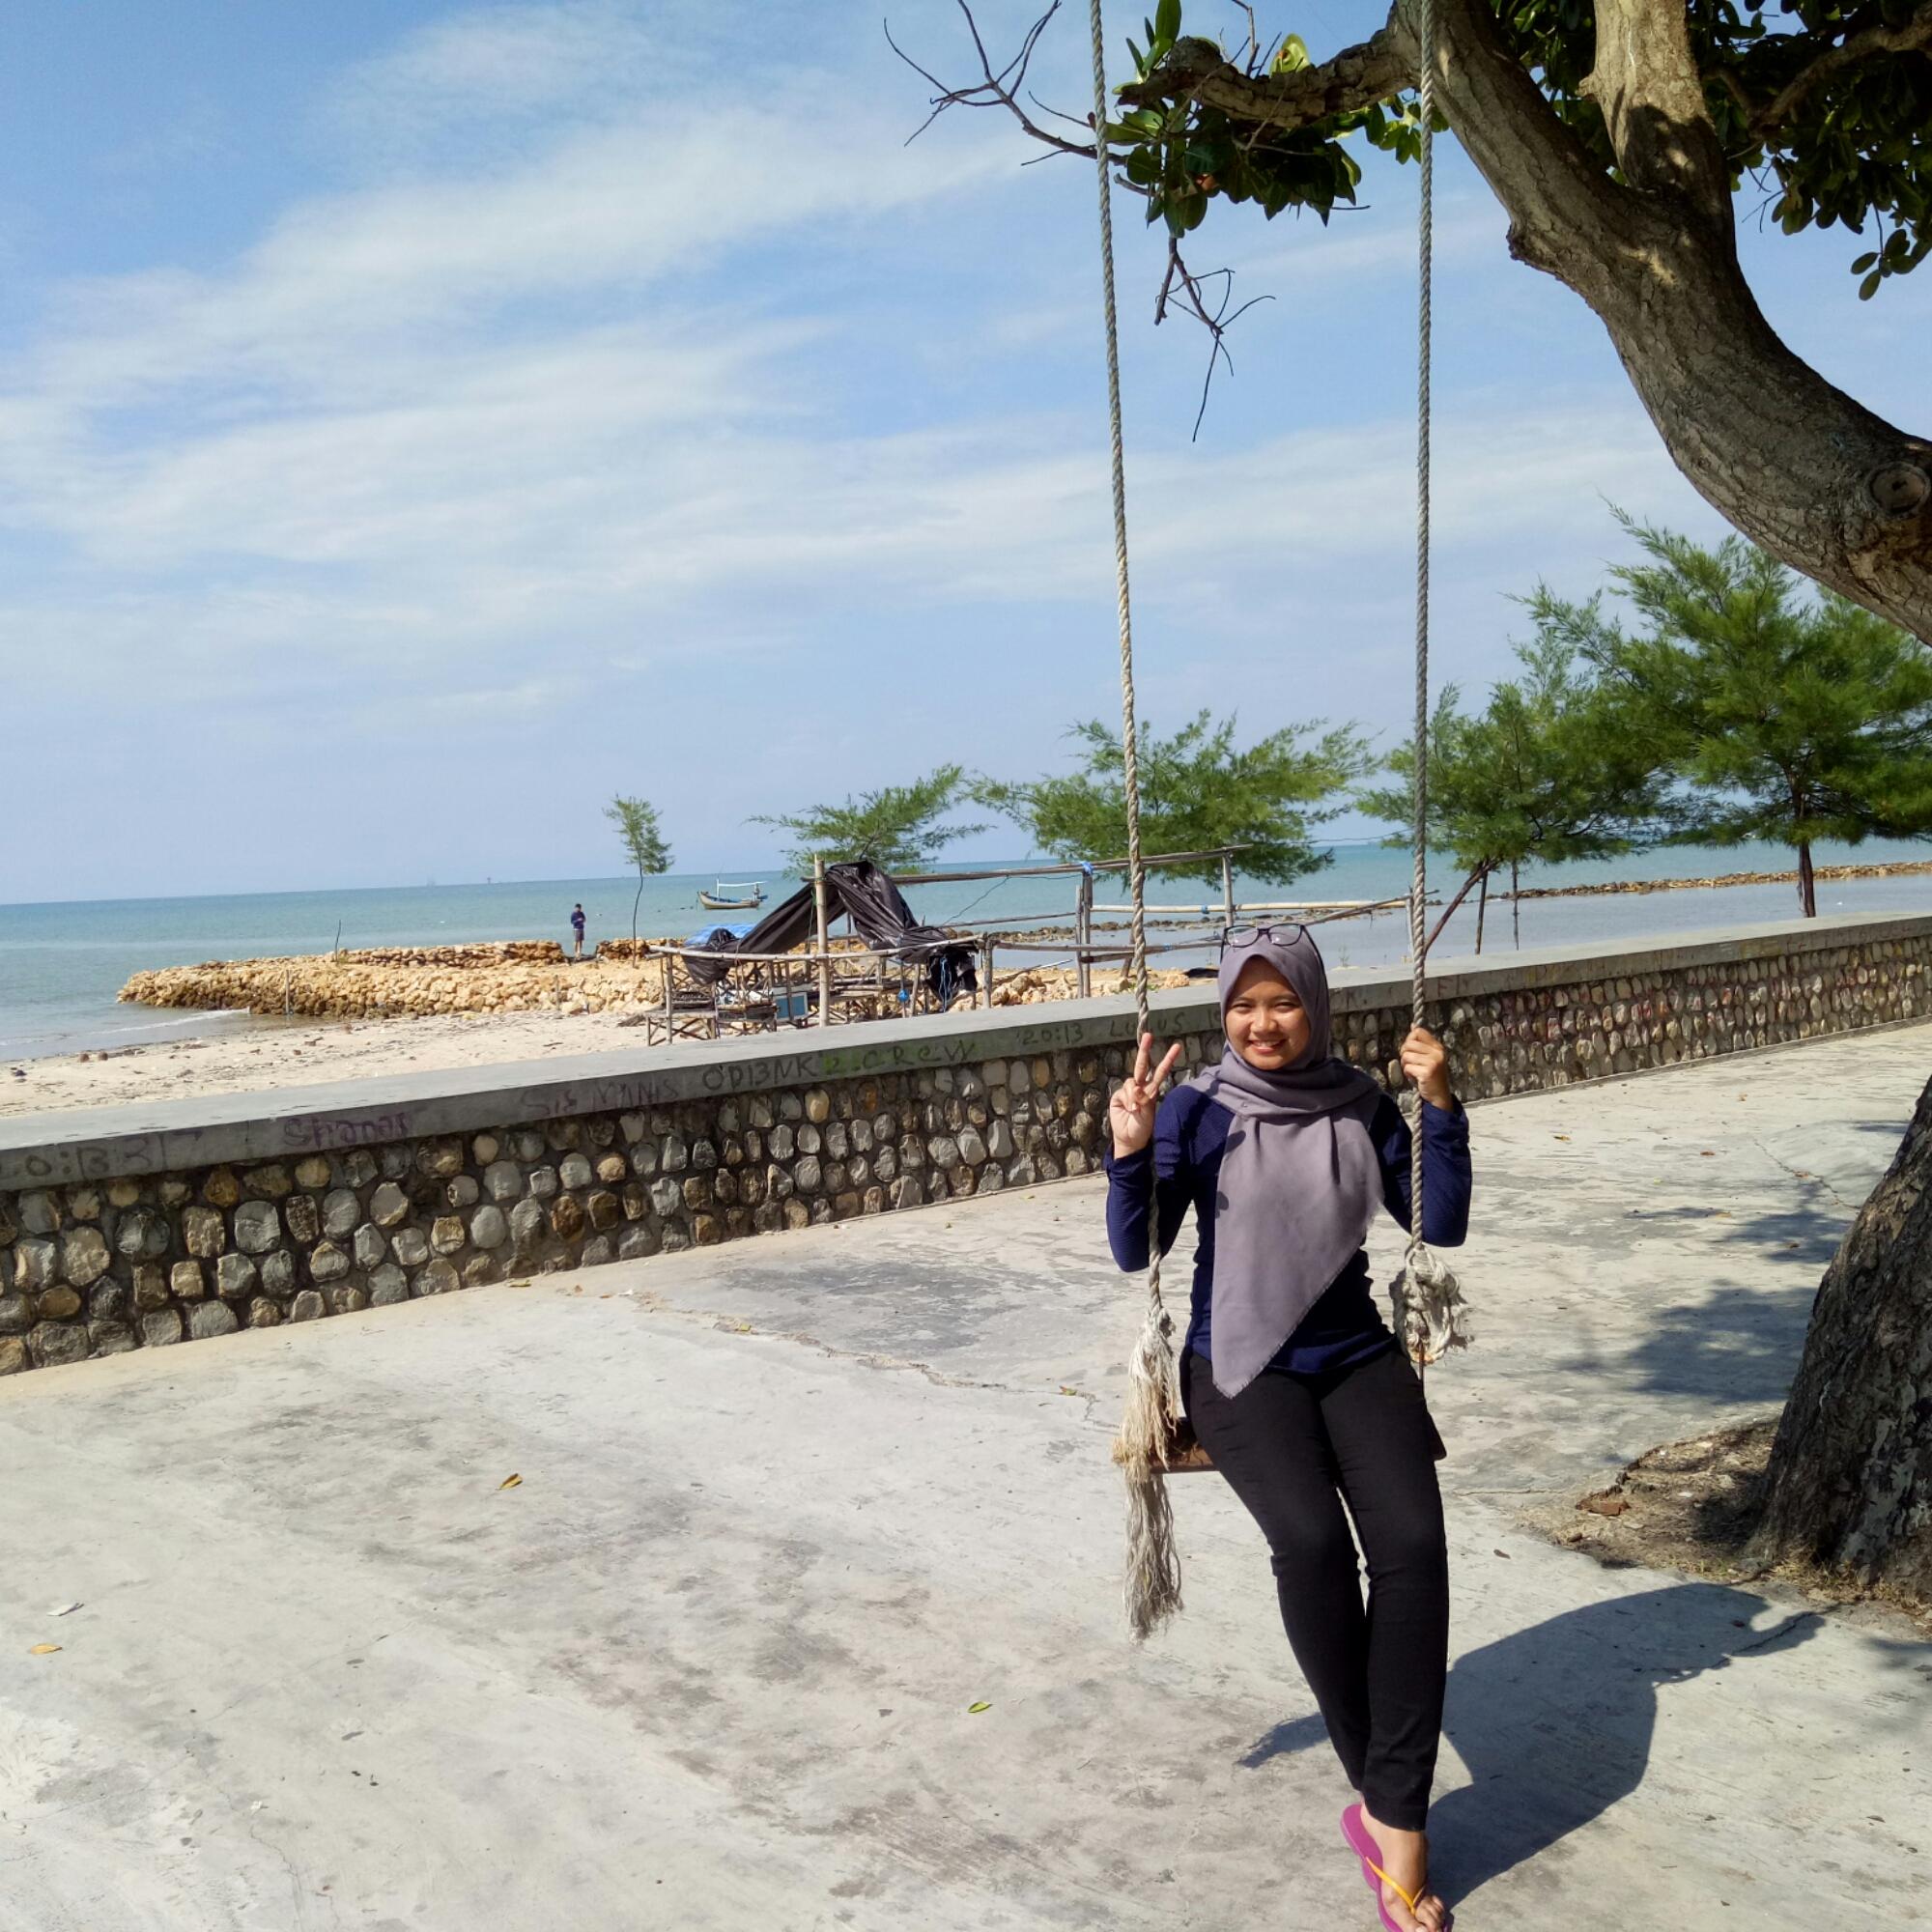 Pantai Camplong Indriemustamil Adapun Kepergian Teman Tvone Biro Surabaya Sampang